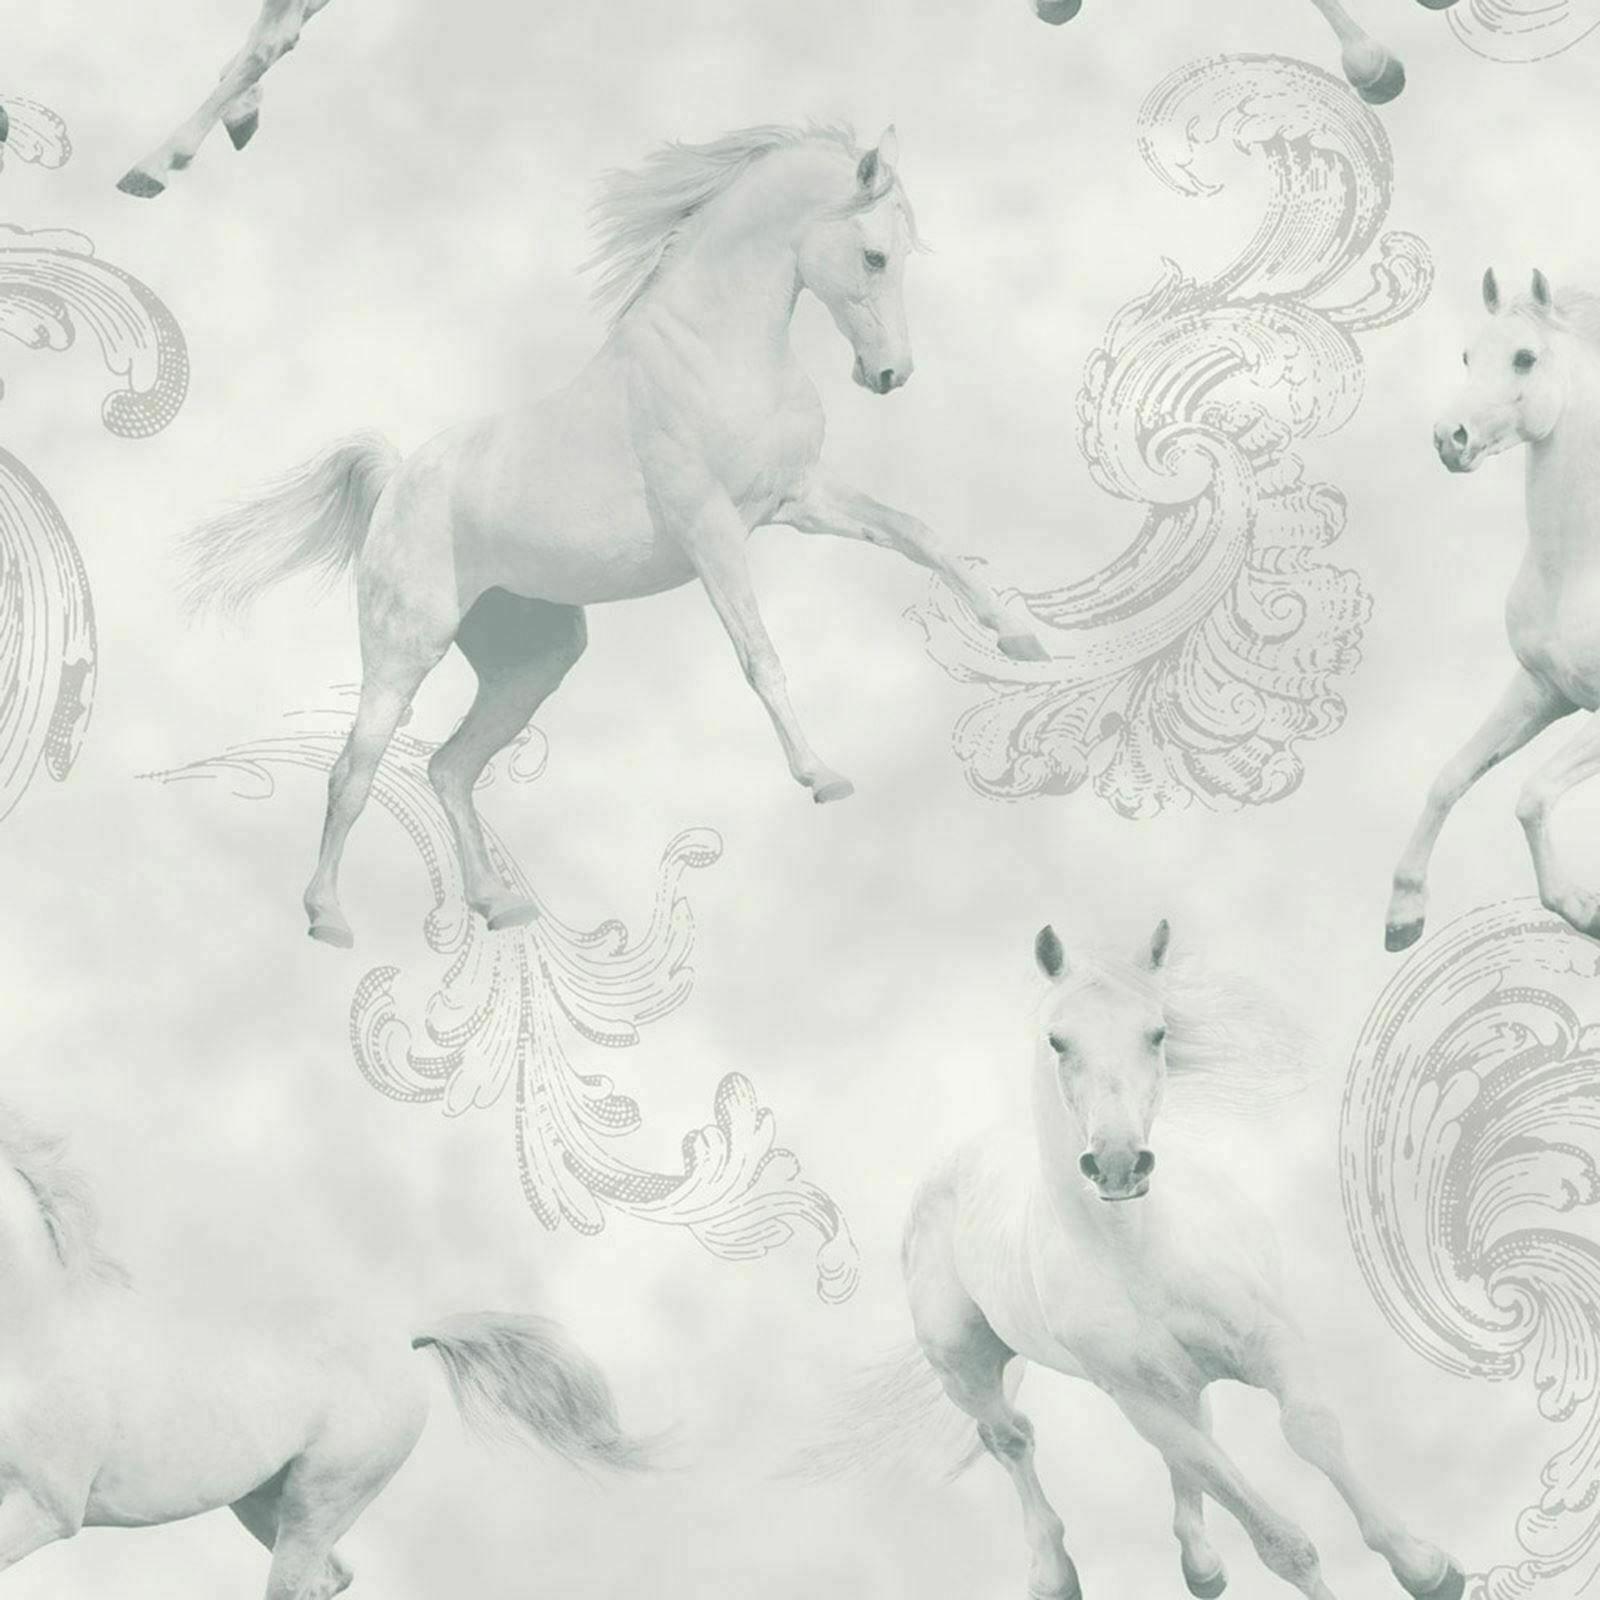 Arthouse Camarillo Light Grey Horses Wallpaper With Silver Glitter 667300 For Sale Online Ebay